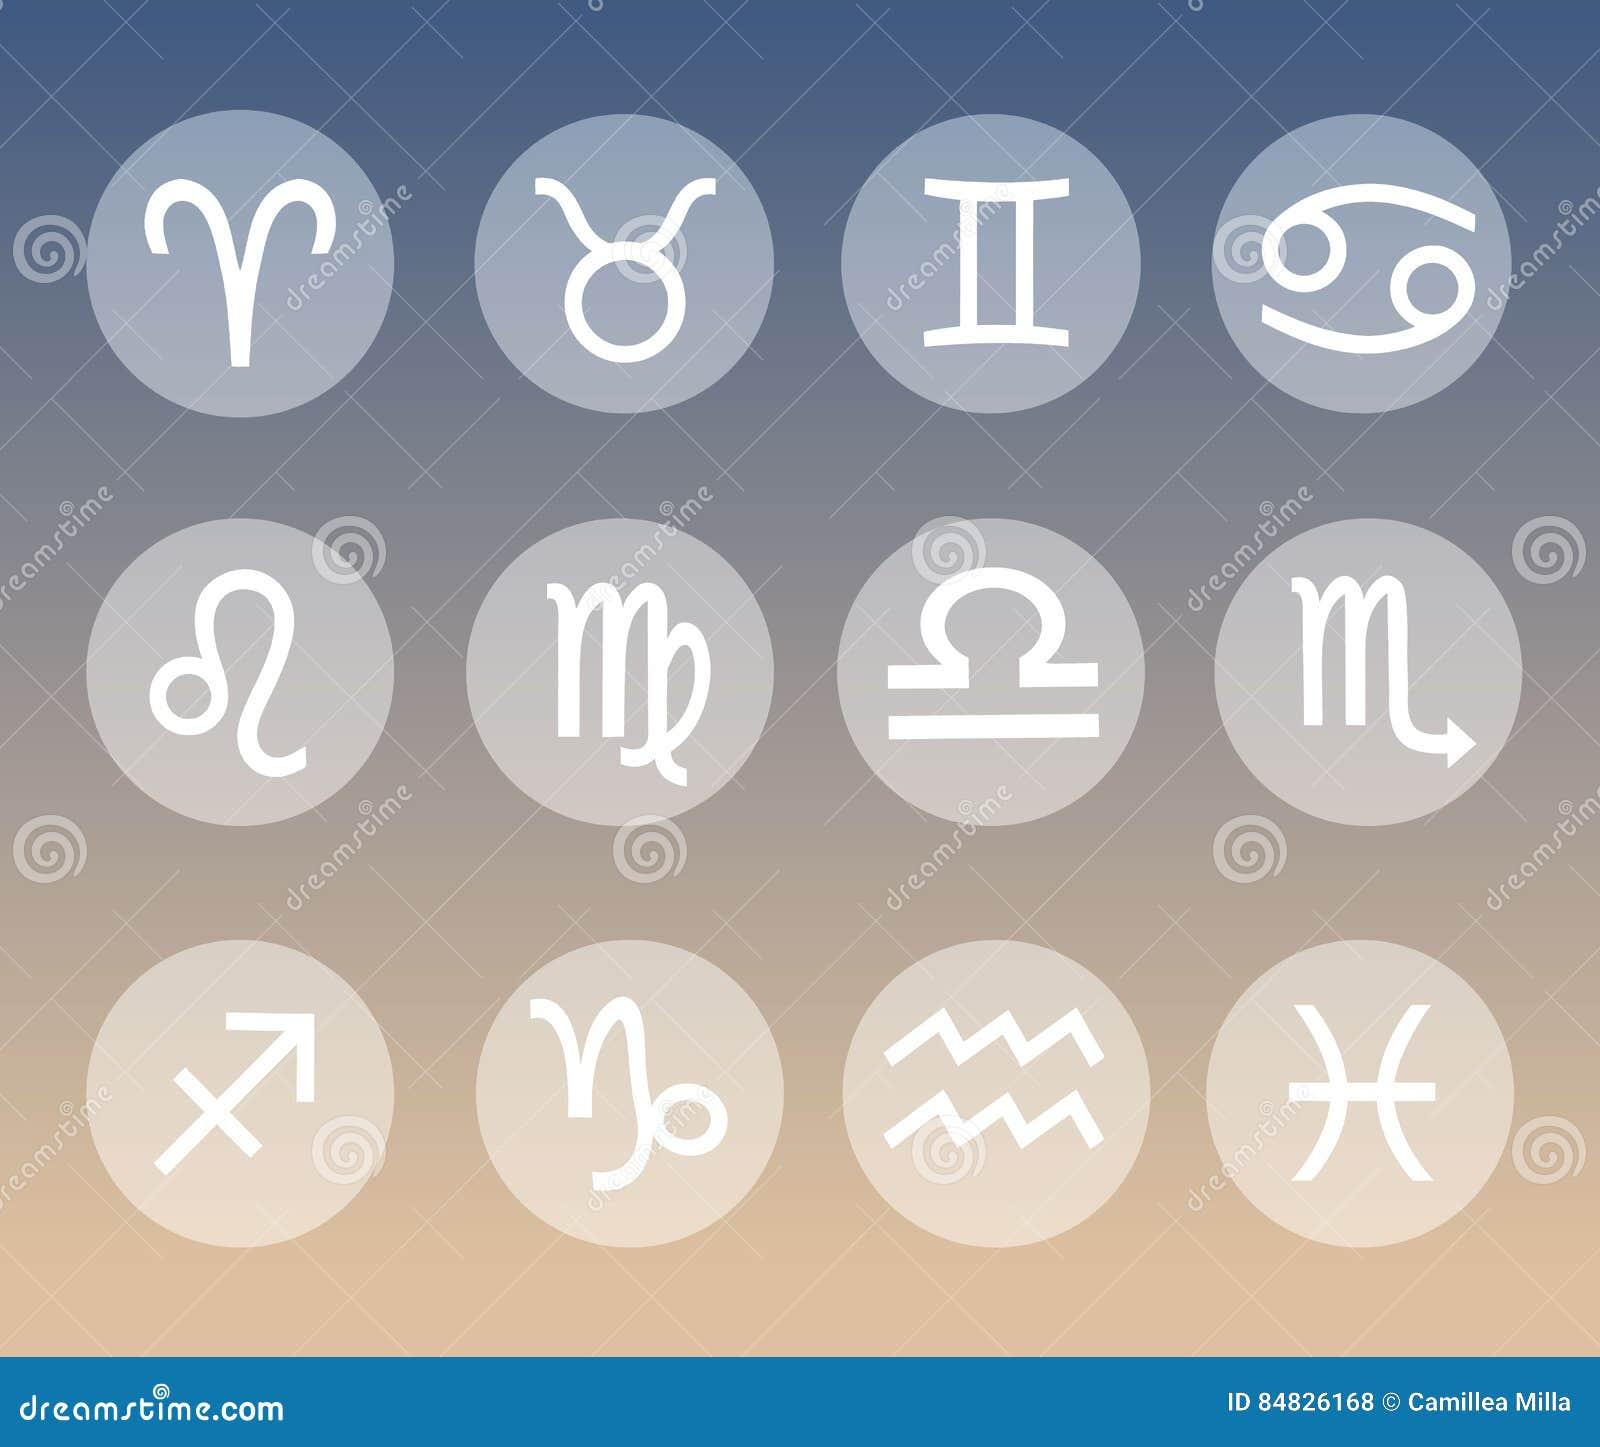 Vektor Planet Astrologisch Astronomische Symbol Satz Illustration